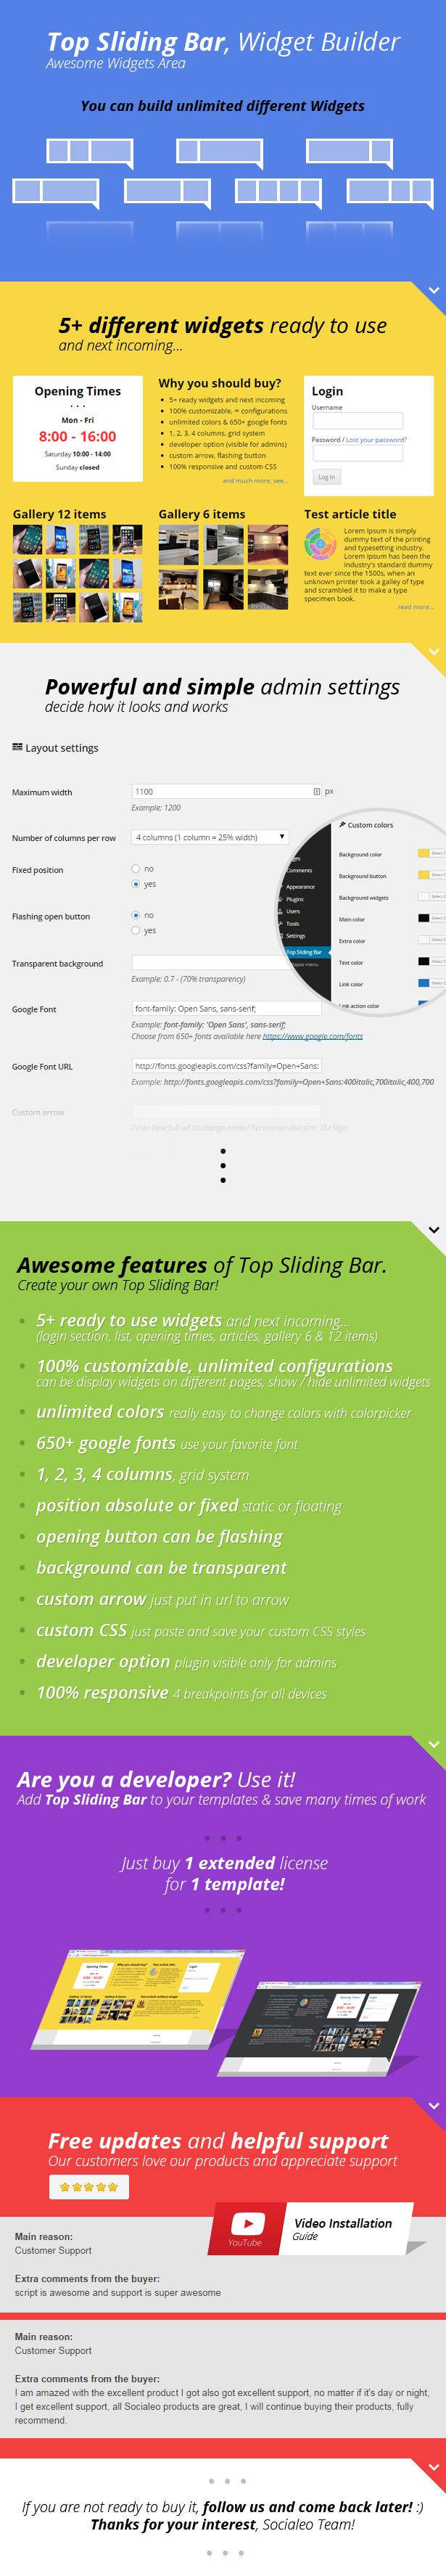 Top Sliding Bar 2